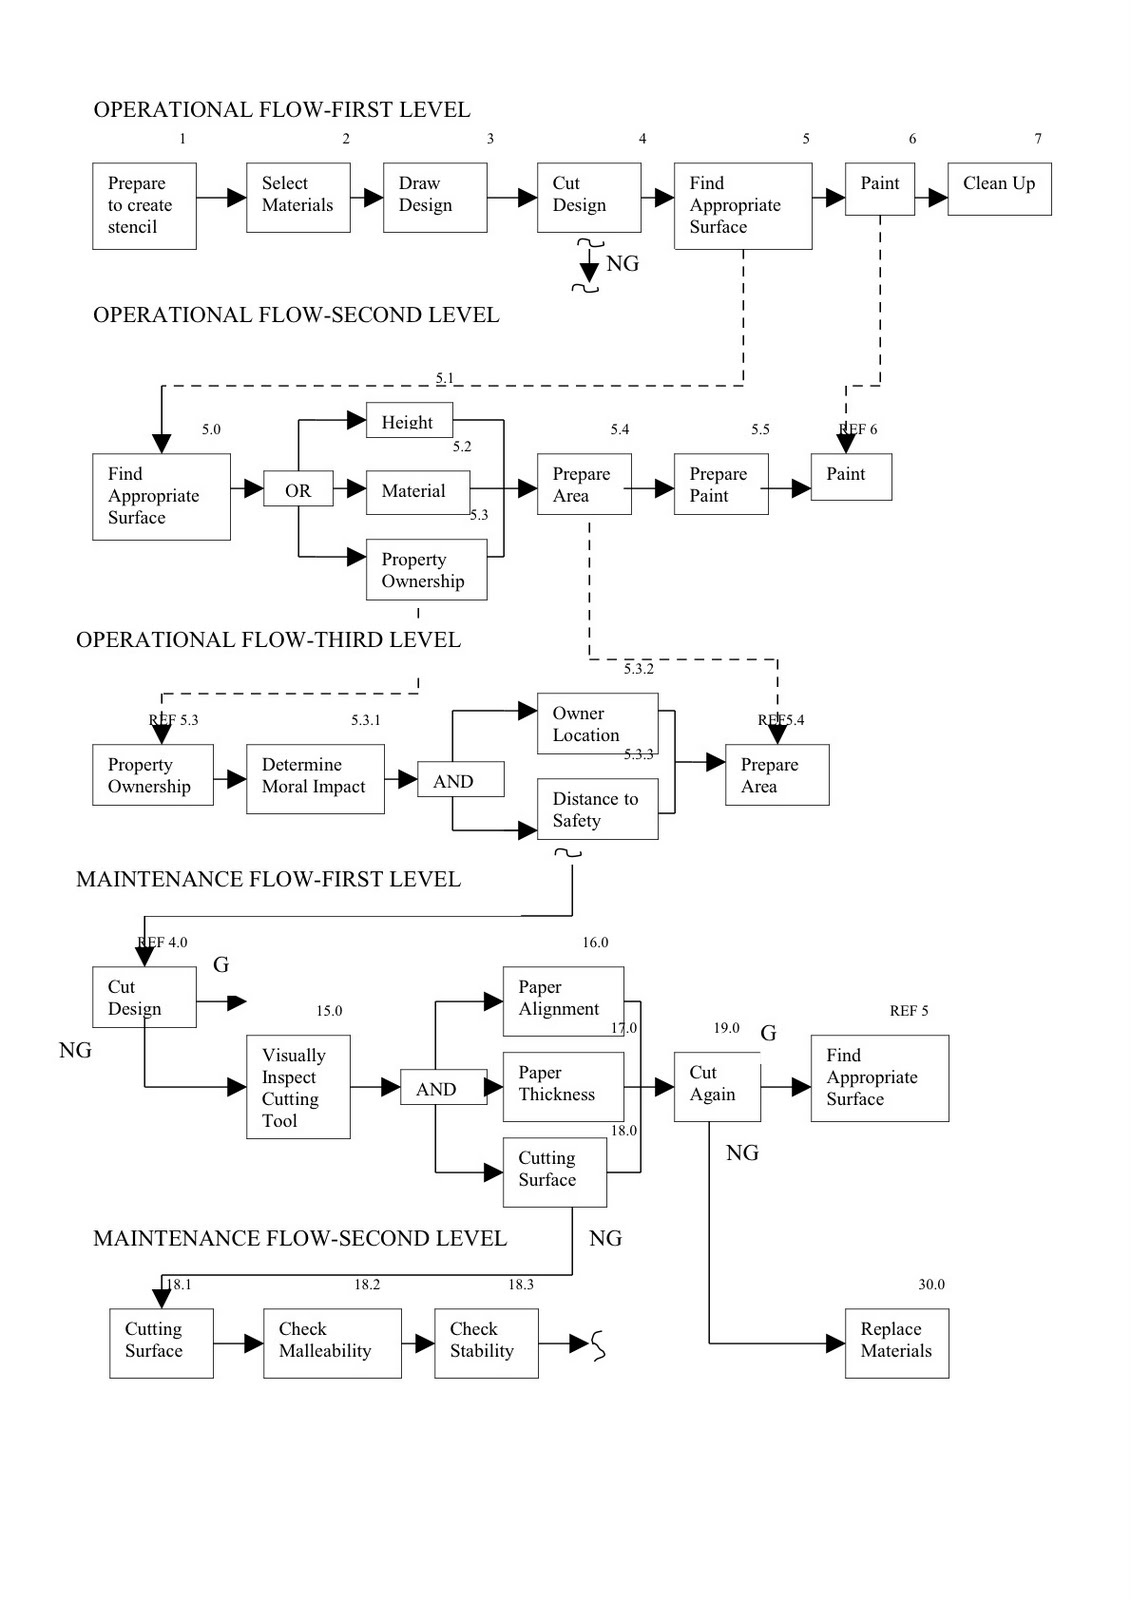 Functional Flow Block Diagram Visio 2004 Hyundai Santa Fe Radio Wiring Sysml  The